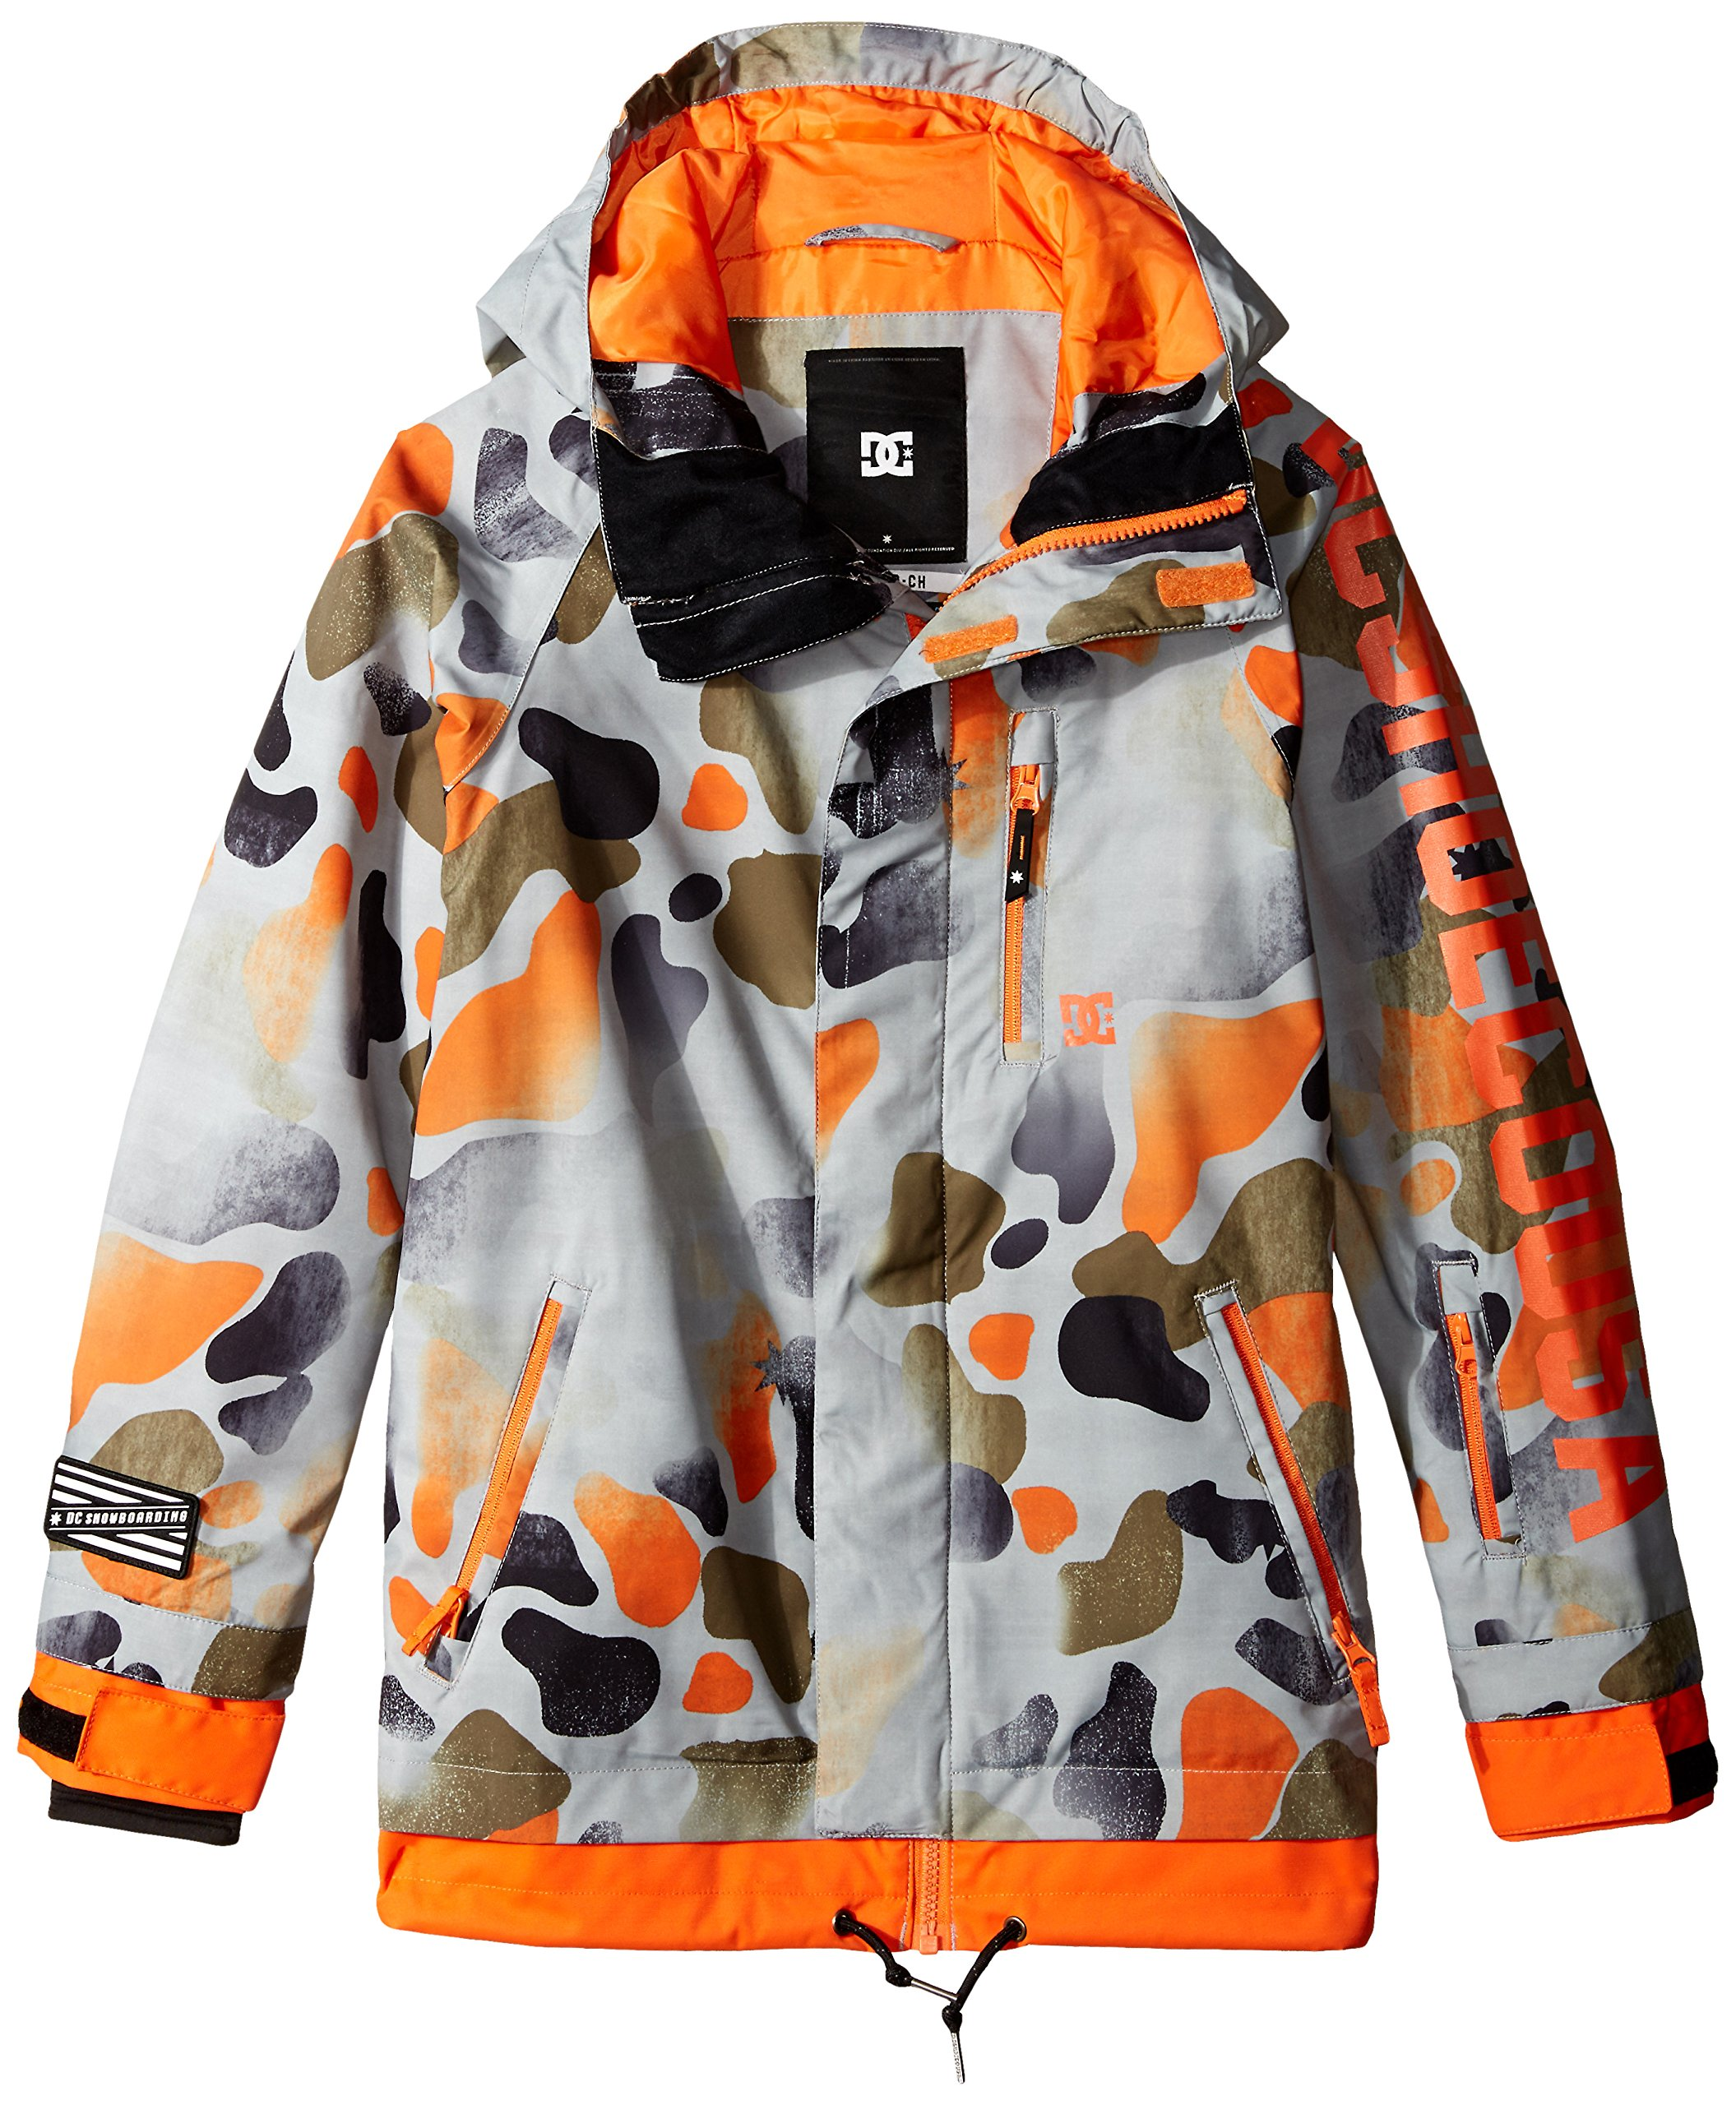 DC Big Boys' Ripley Boy Snow Jacket, Desert Camo Youth, 14/Large by DC Apparel (Image #1)